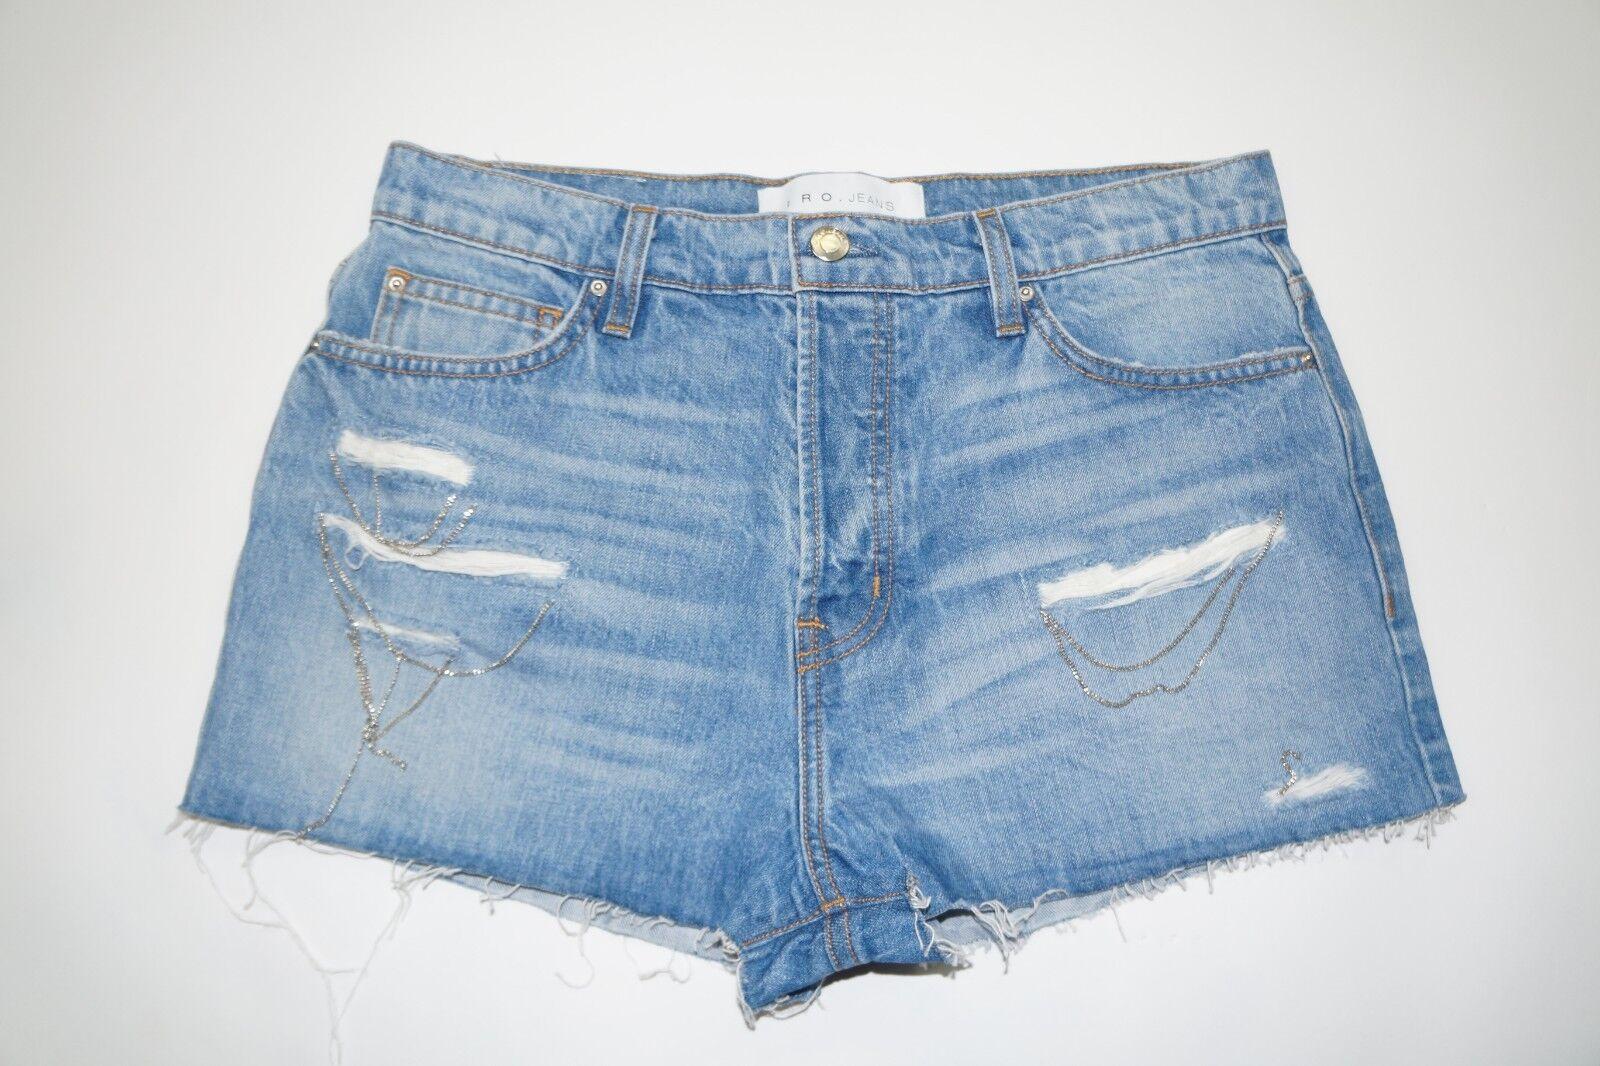 IRO Denim Gacily Chain Detail High Waisted Jean Shorts